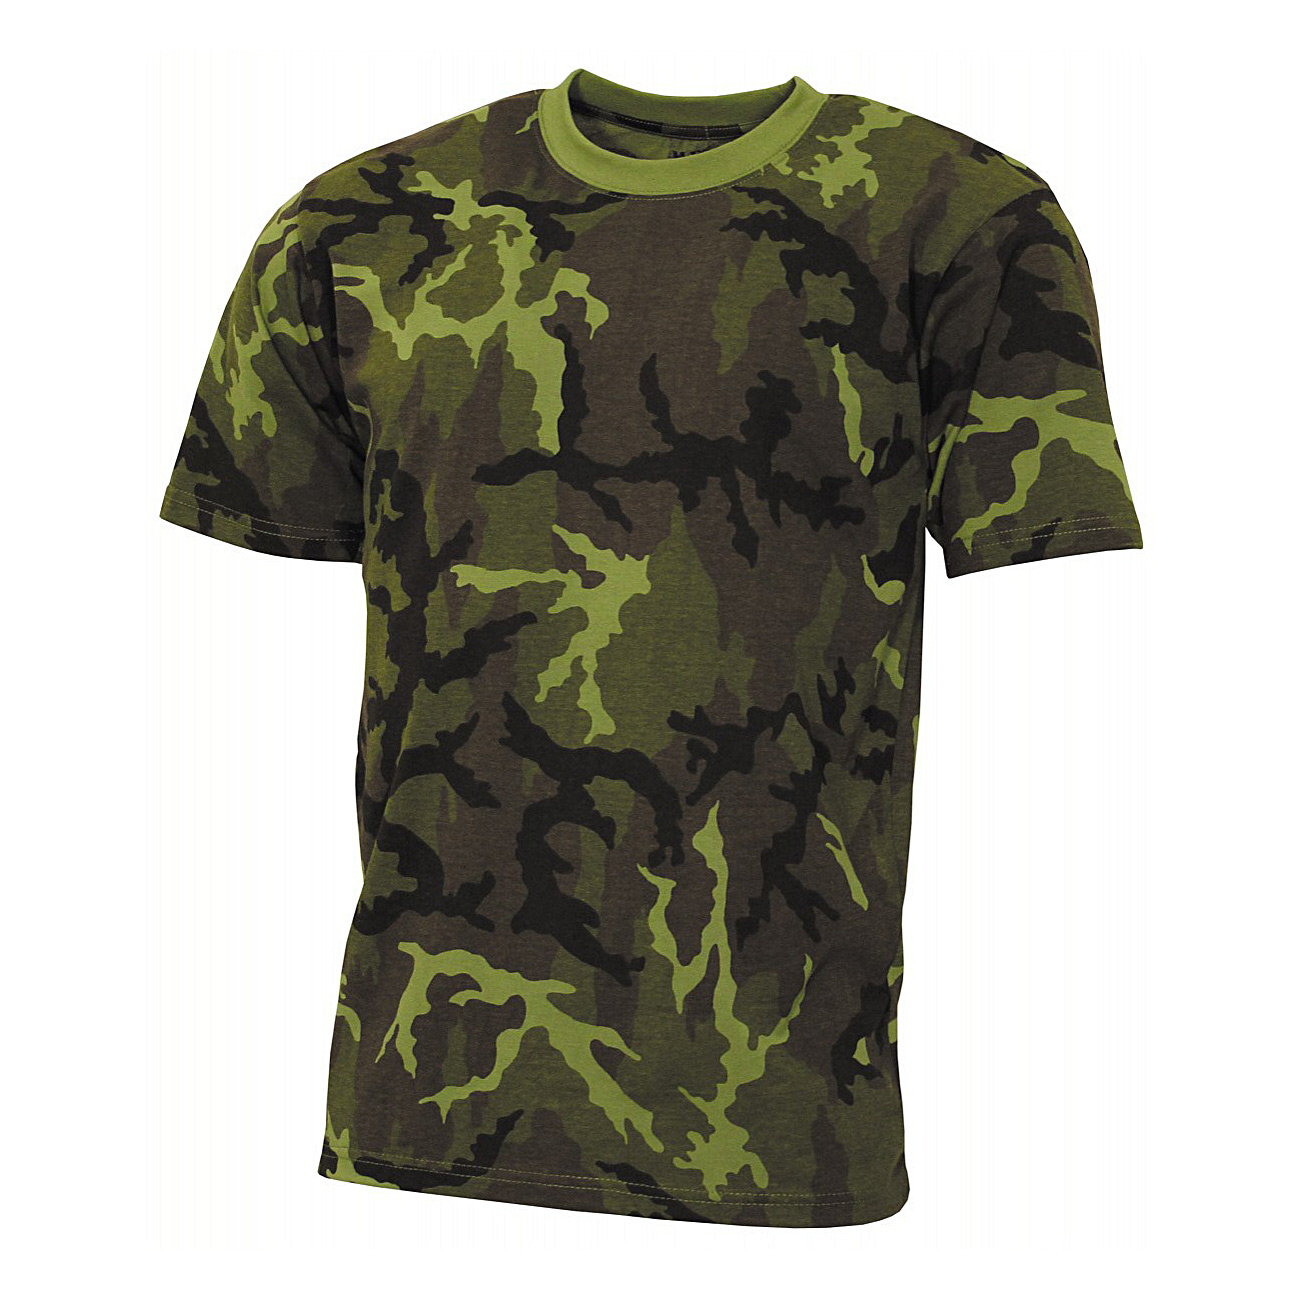 d0335505b49368 MFH US T-Shirt Streetstyle M 95 CZ tarn günstig kaufen - Kotte & Zeller